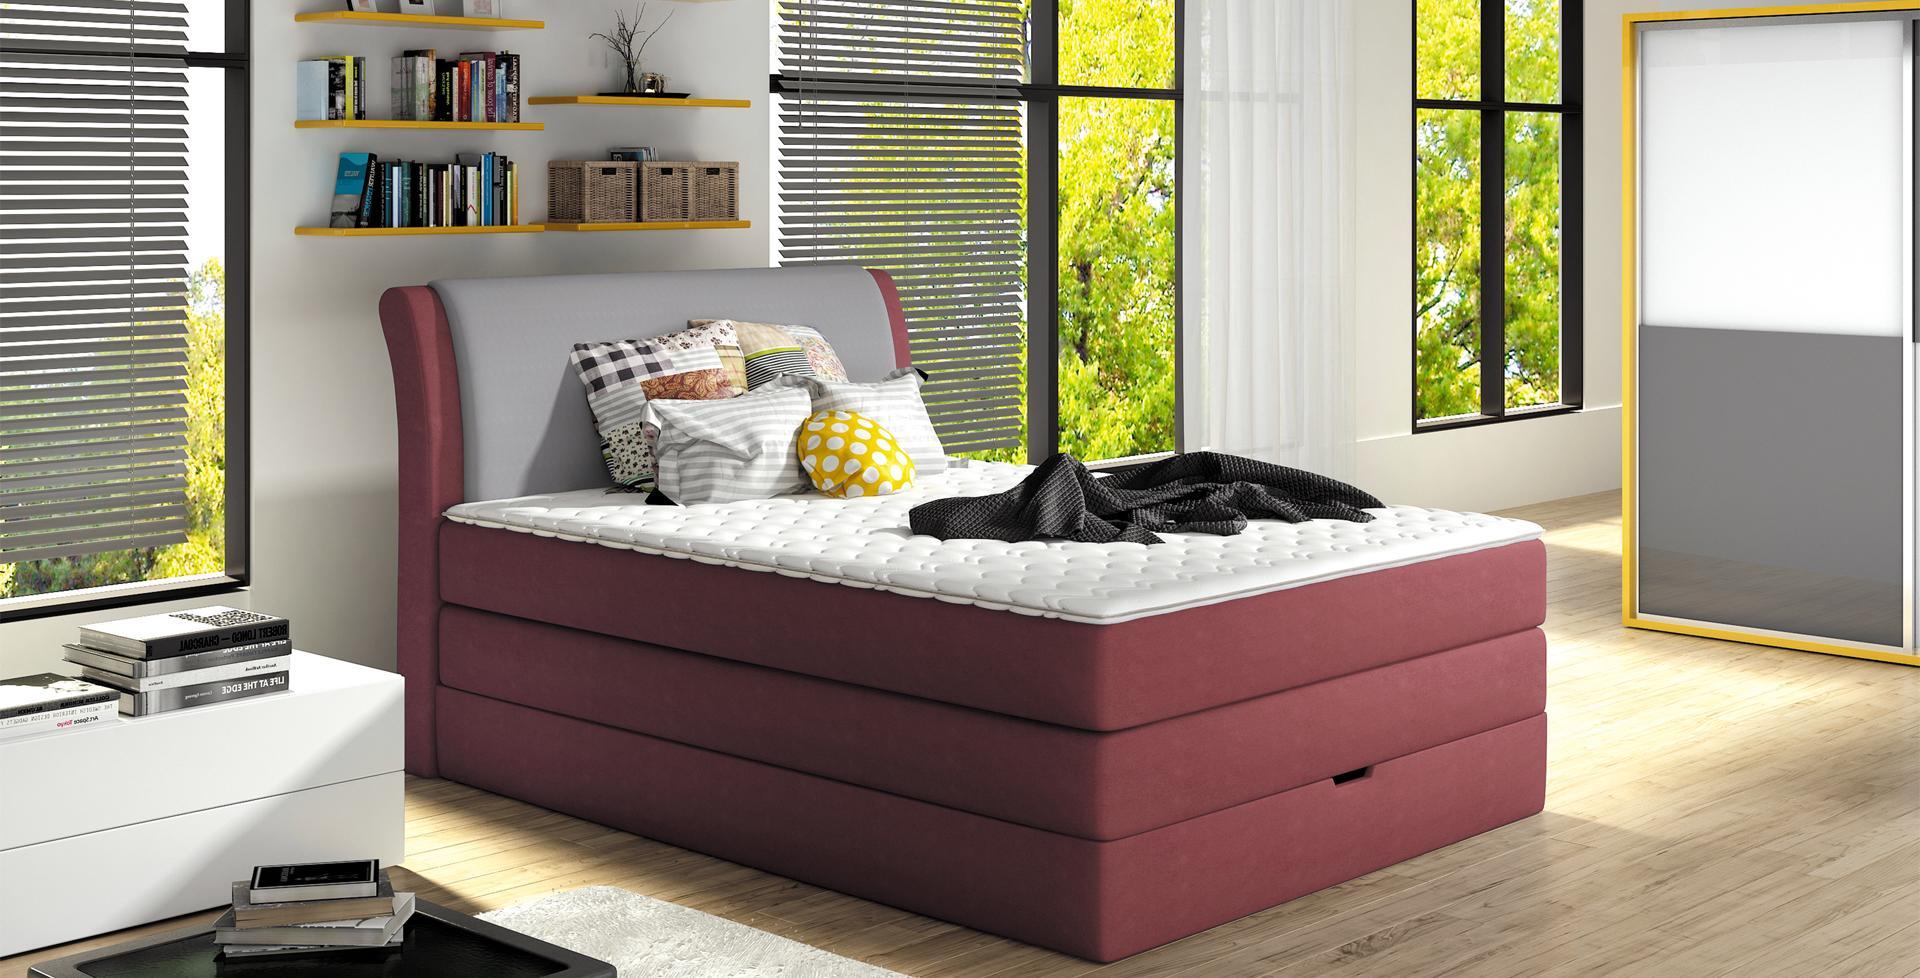 design betten in hochwertiger qualit t oder rundbett amalfi bei jv m bel. Black Bedroom Furniture Sets. Home Design Ideas